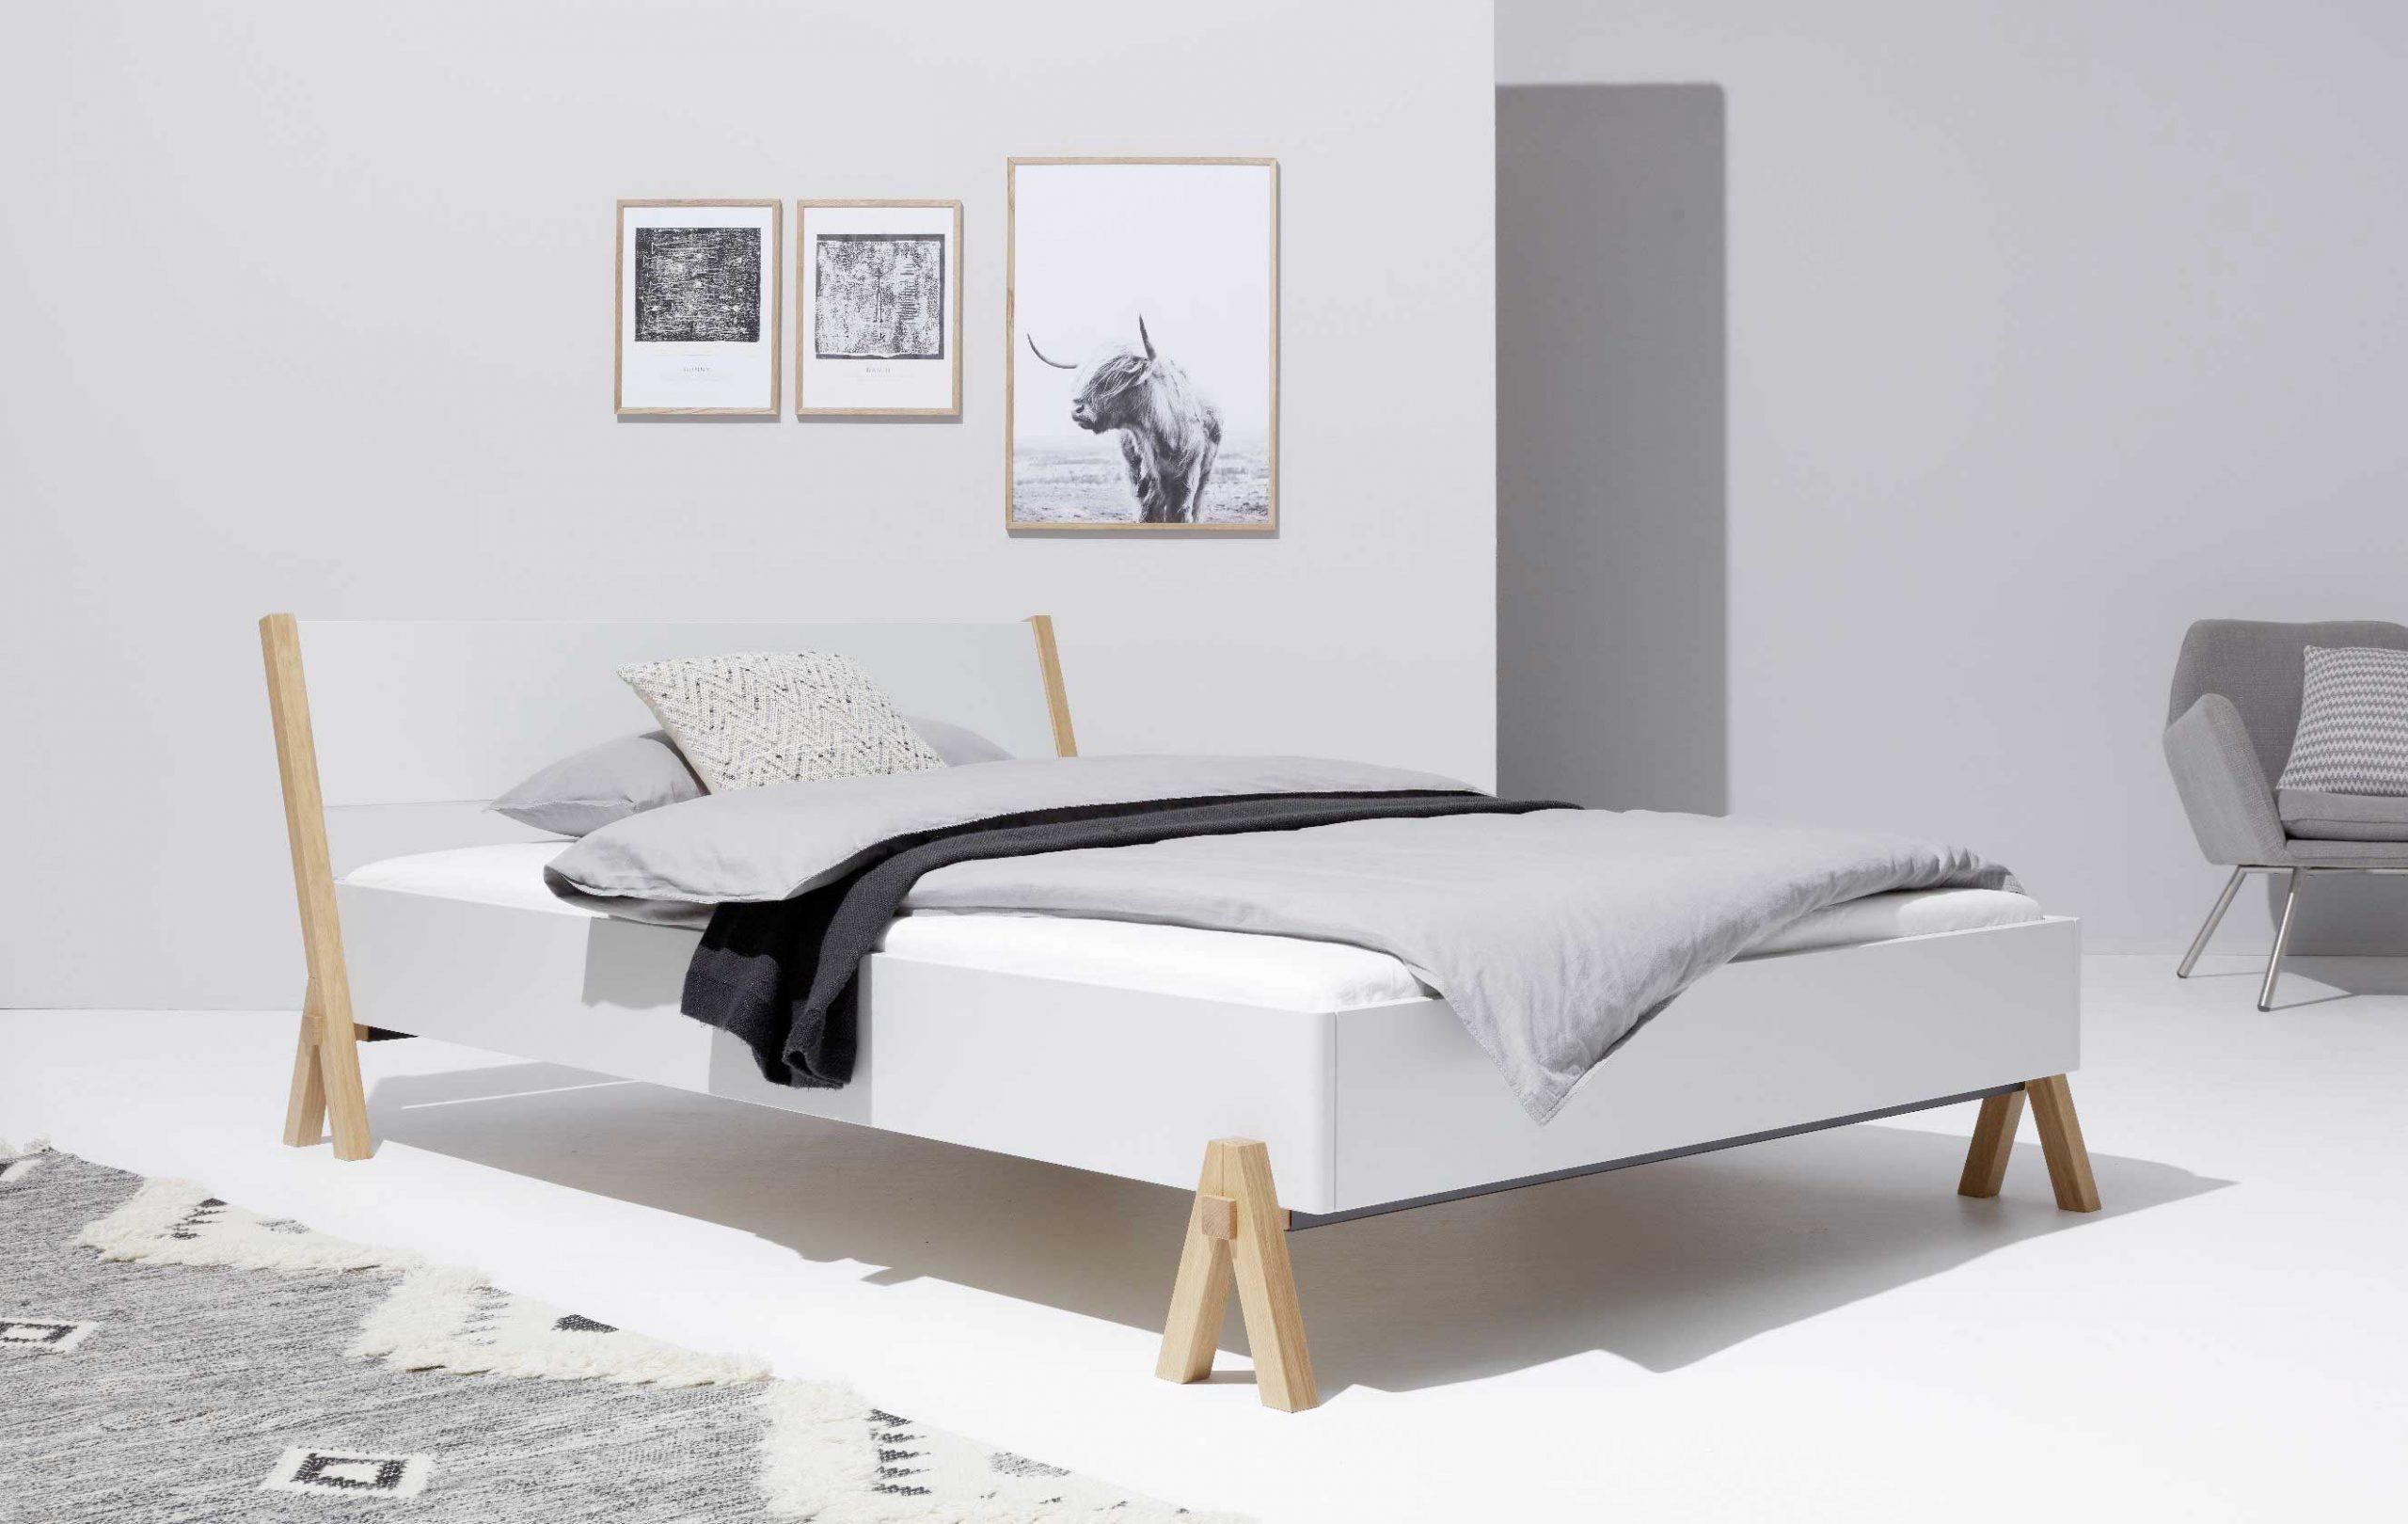 Full Size of Bett 160x200 Mit Lattenrost Designwebstore Boq Weiss 140 200 Cm Unterbett 120 X Roba Cars Inkontinenzeinlagen Home Affaire Japanische Betten Stauraum Selber Bett Bestes Bett